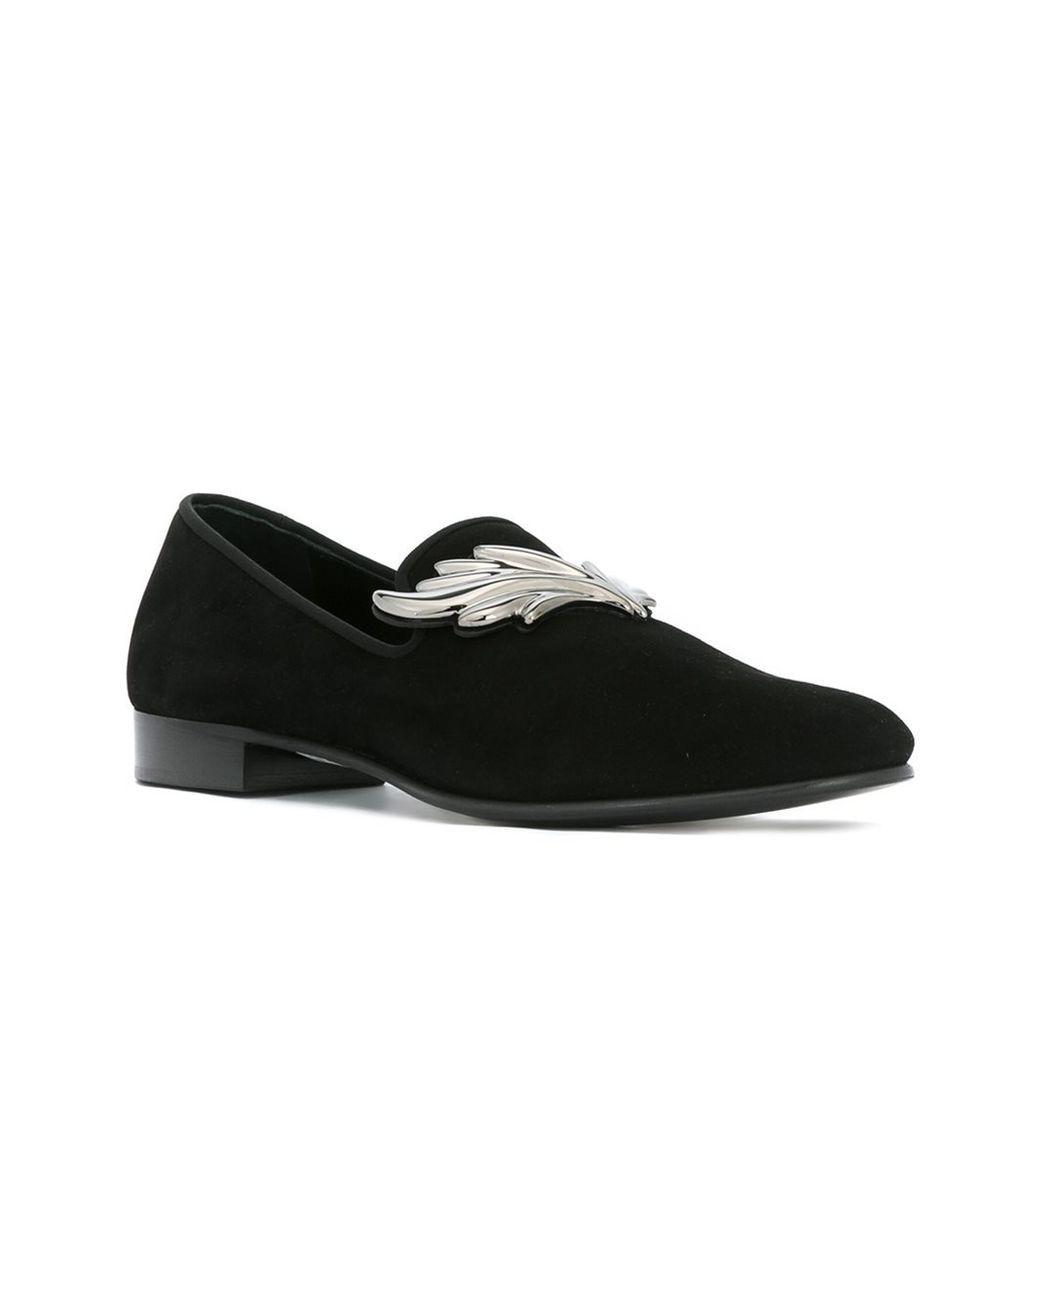 Buy Giuseppe Zanotti Men's Black 'cruel' Slippers, starting at €665. Similar